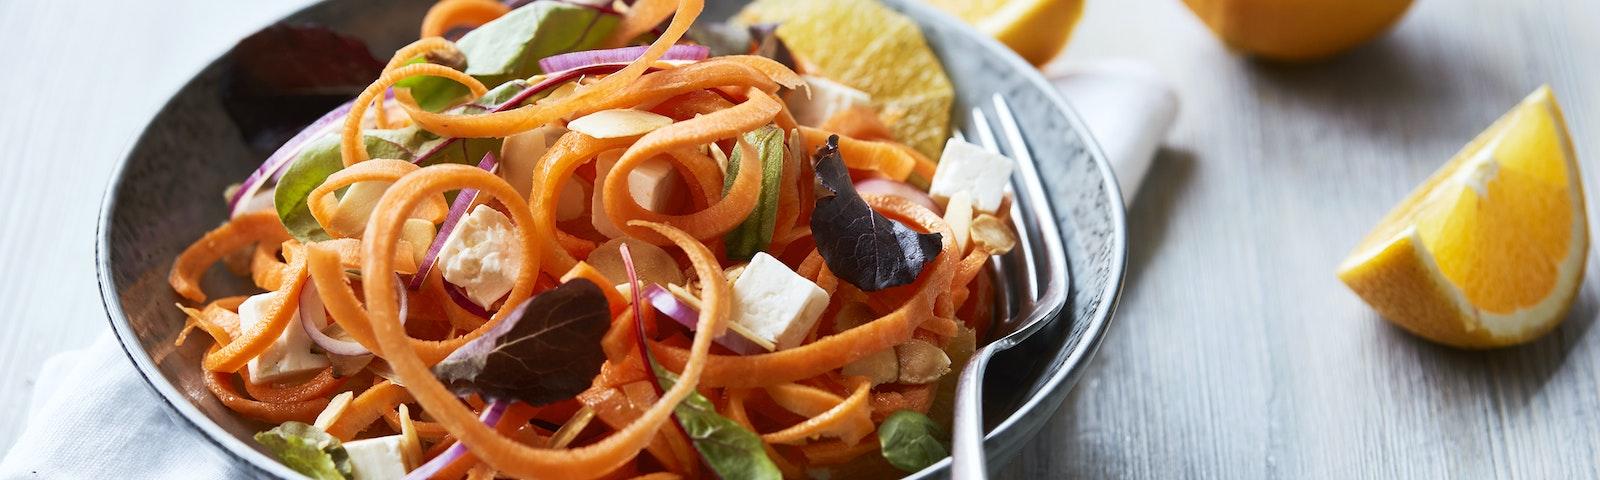 Spiralsalat med gulerod, appelsin & salattern